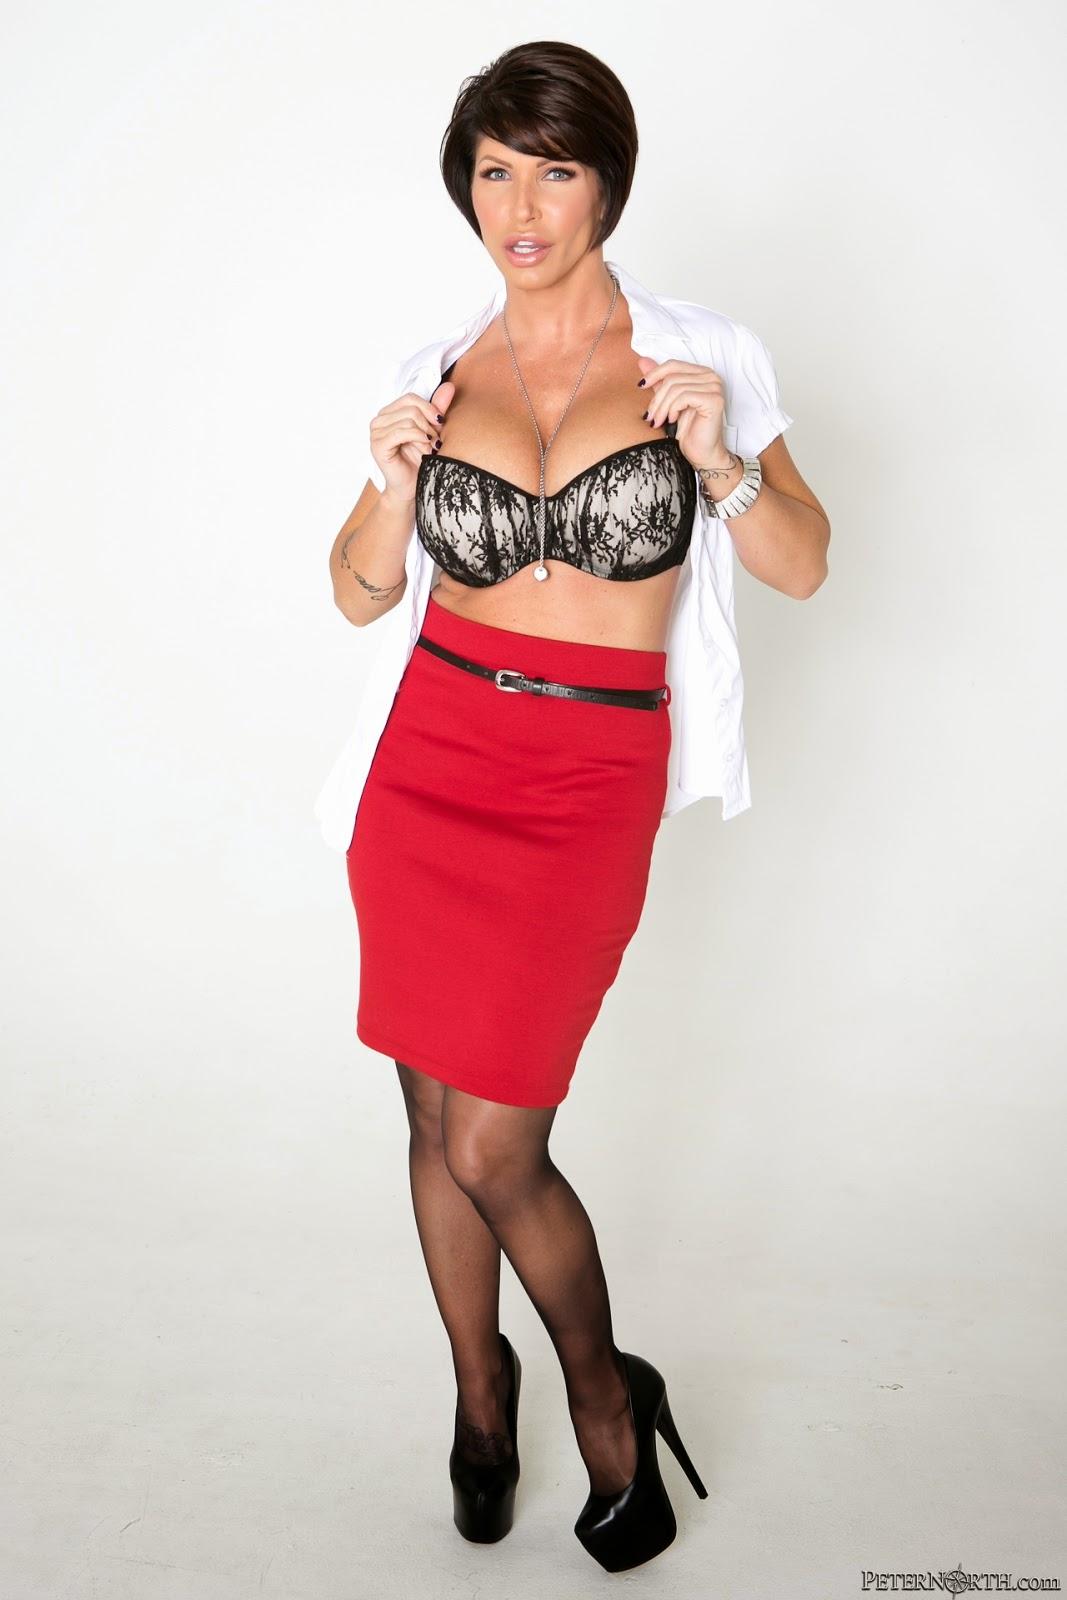 Hot Shay Fox in Black Underwear looking saucy   Shay Fox